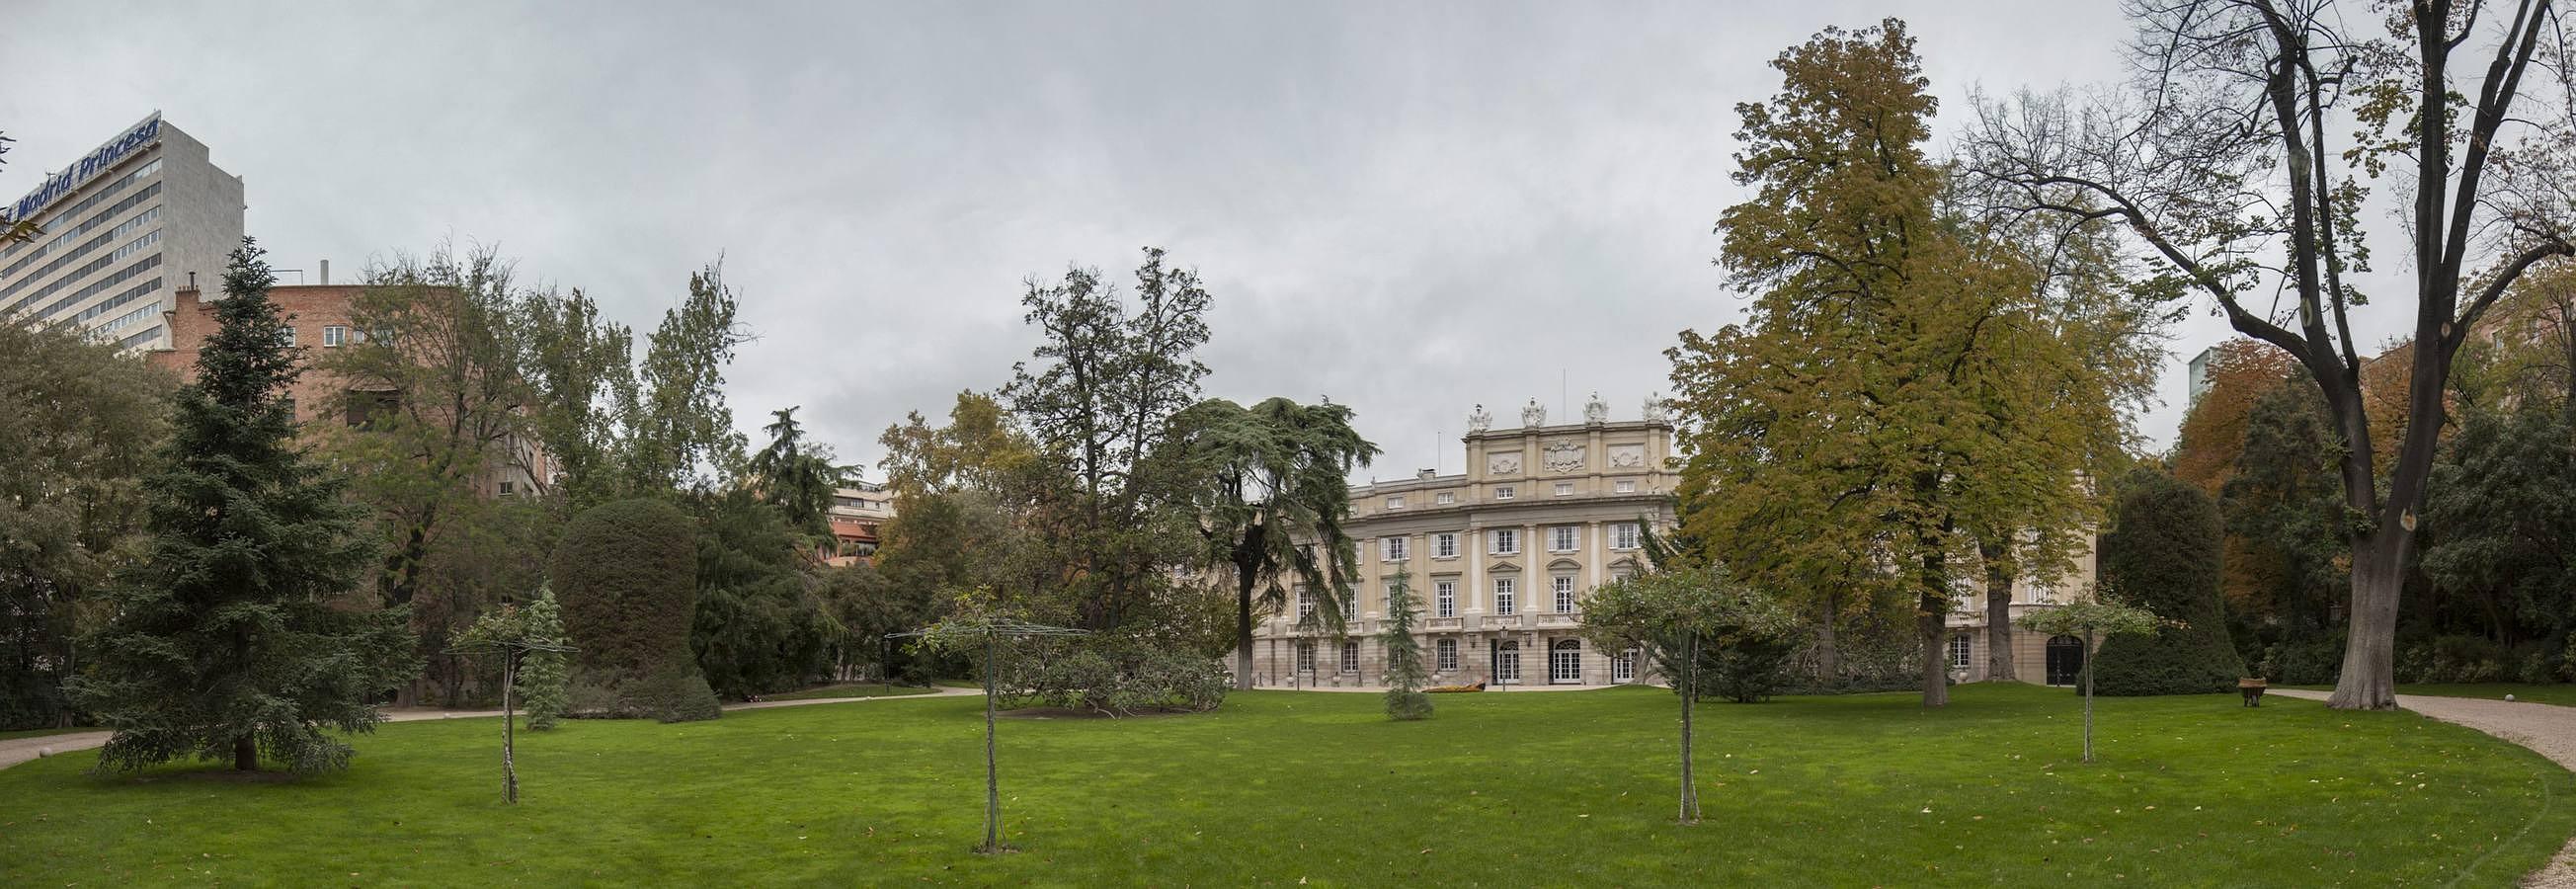 Viaje al interior del Palacio de Liria, la majestuosa residencia de la Casa de Alba